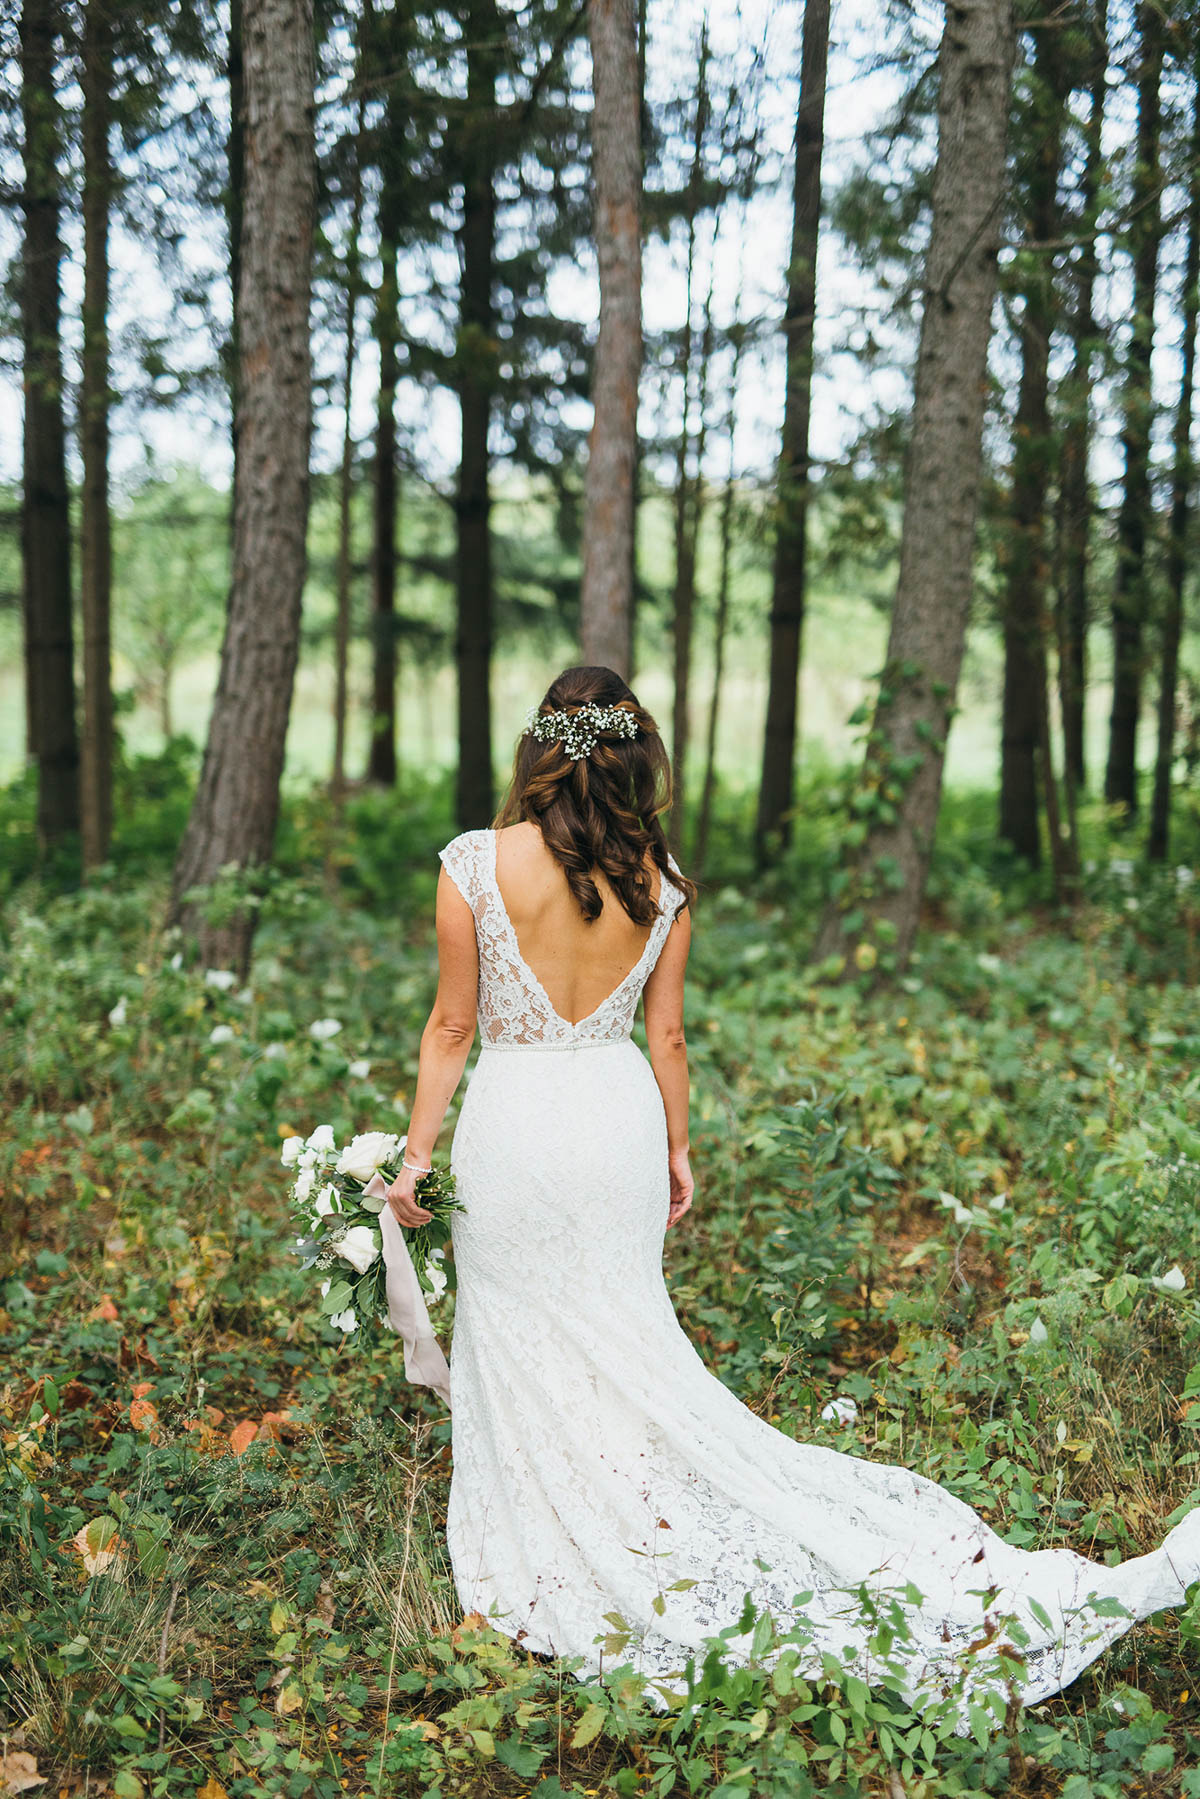 shaw-events-vineyard-bride-swish-list-kurtz-orchards-niagara-on-the-lake-wedding-76.jpg